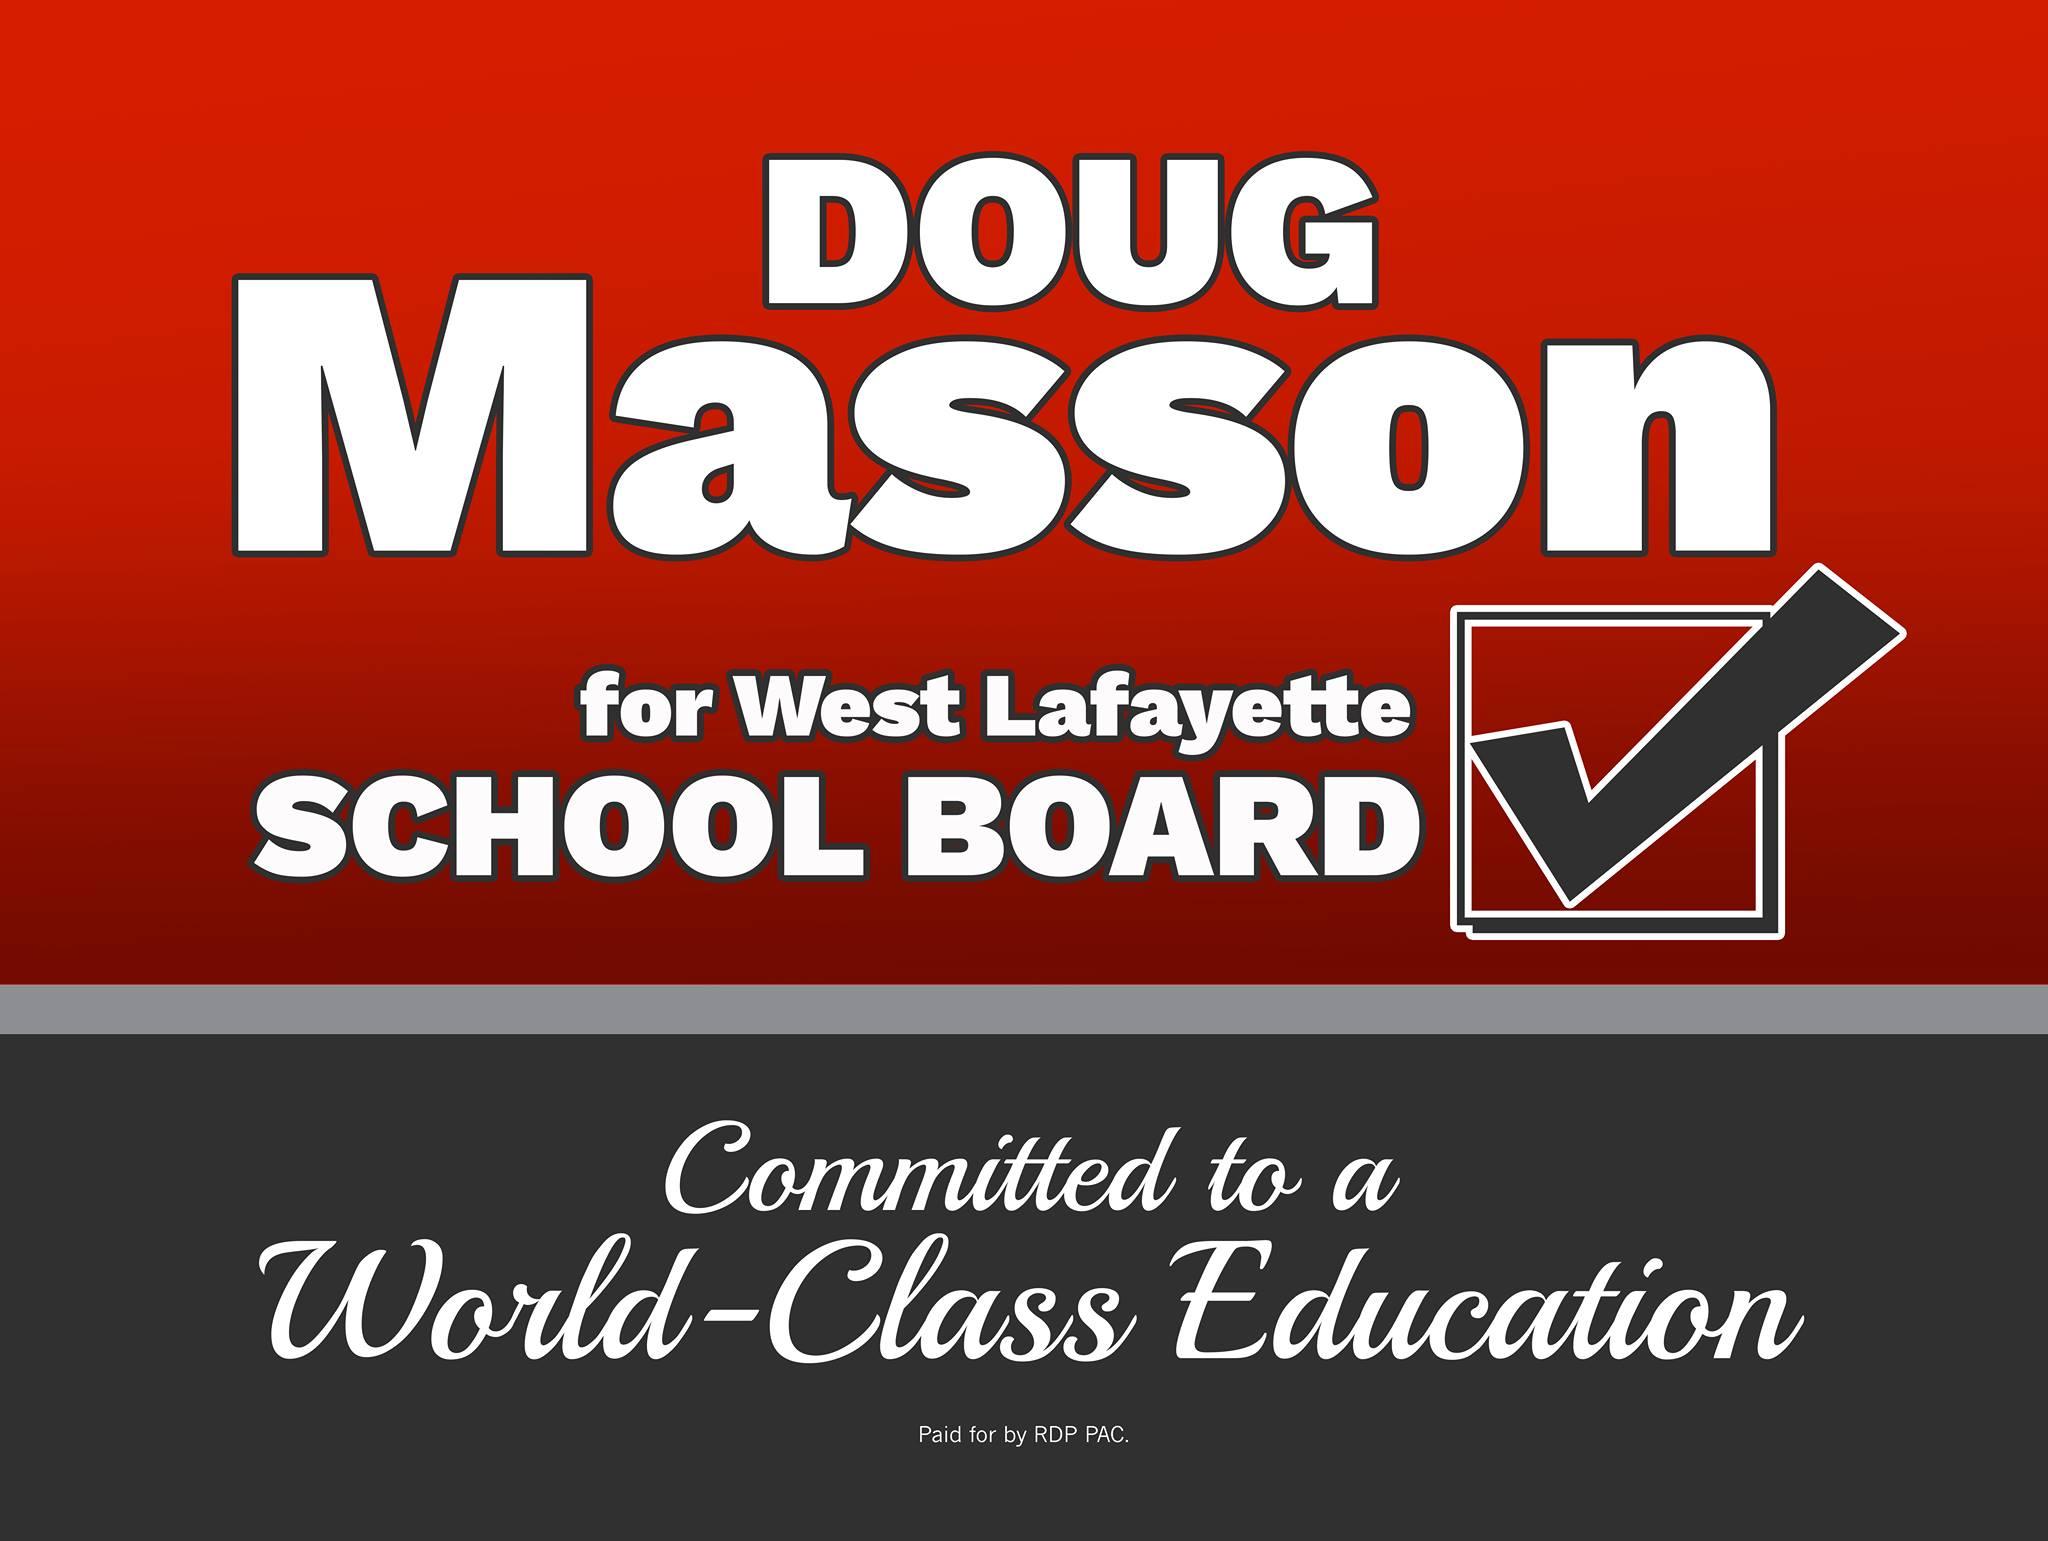 2016-11-01-doug-masson-for-wlsb